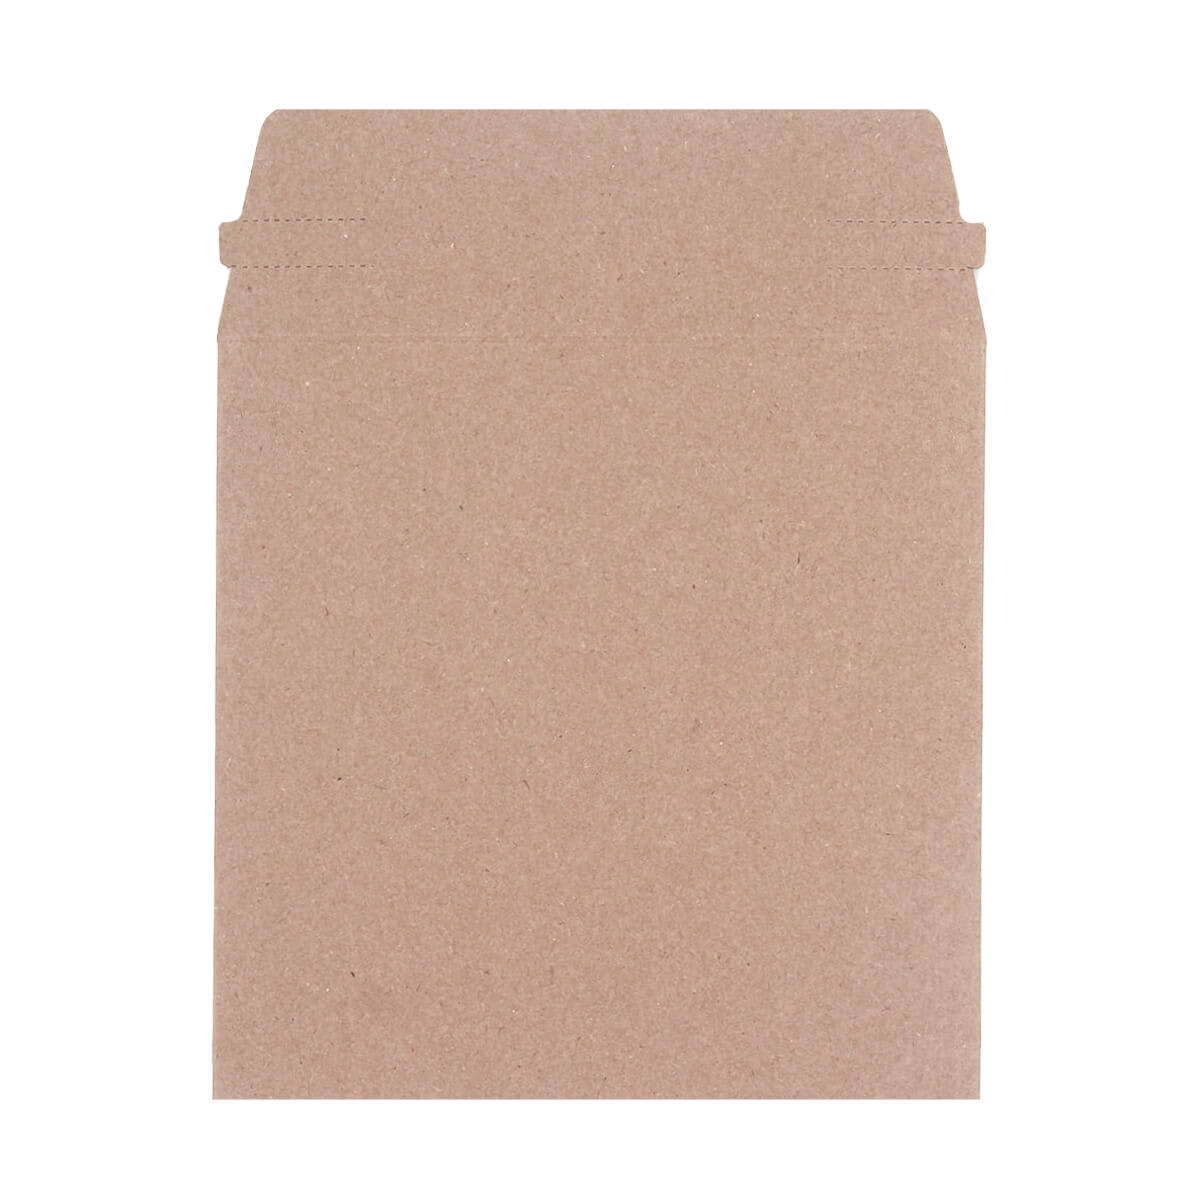 MANILLA CAPACITY BOOK MAILER 150 X 150 MM (300 gsm)